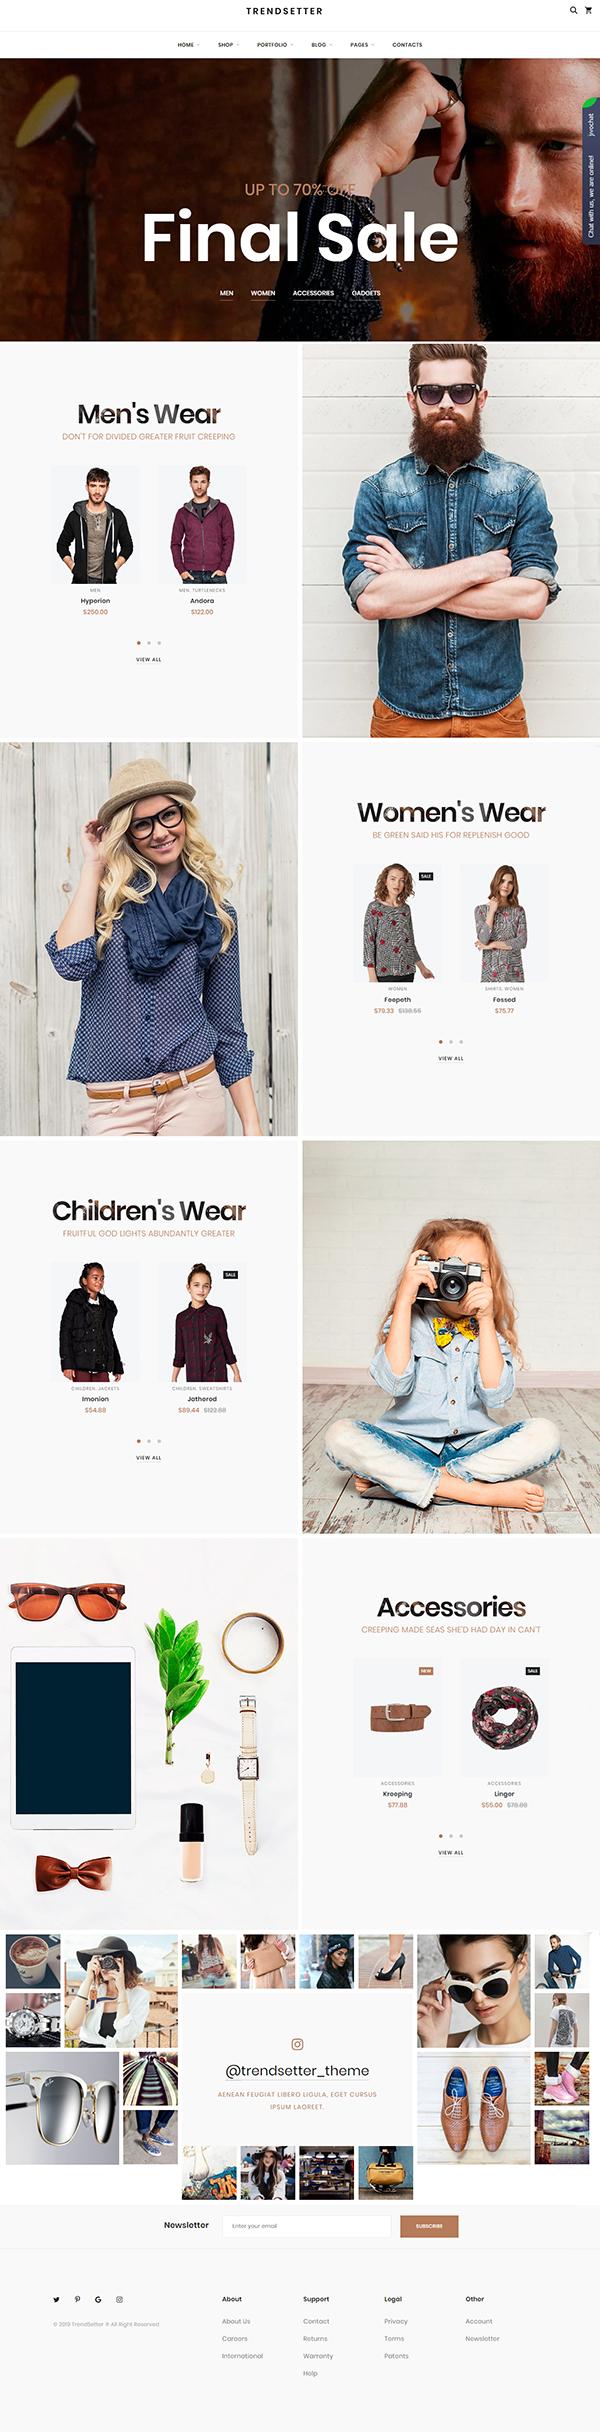 Trendsetter - WooCoomerce Modern Fashion Store